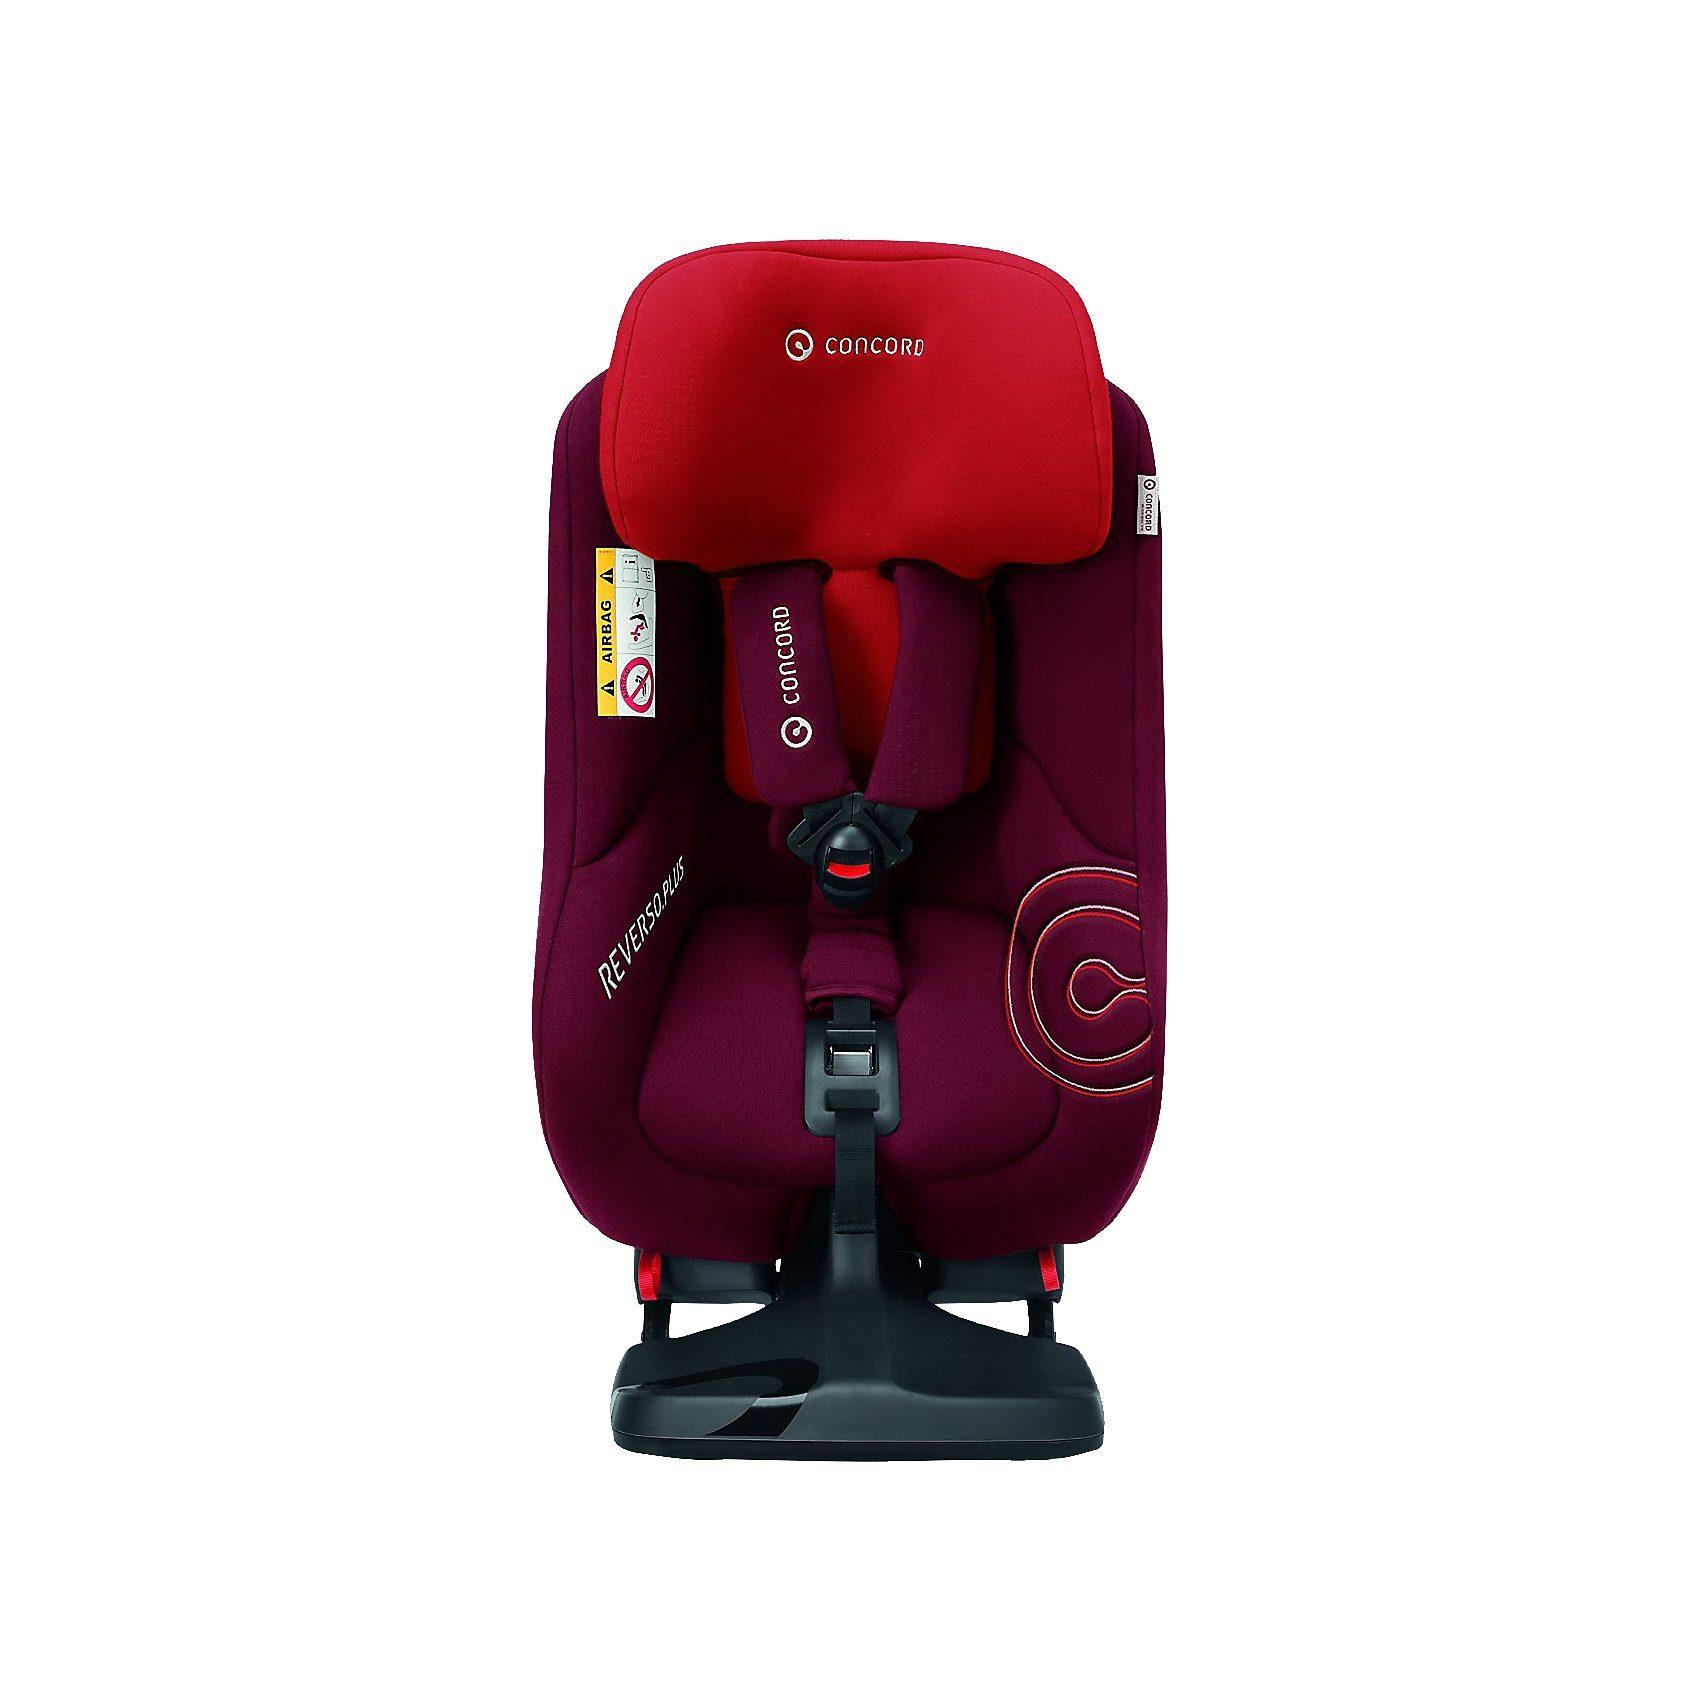 Concord Auto-Kindersitz Reverso Plus, Tomato Red, 2016